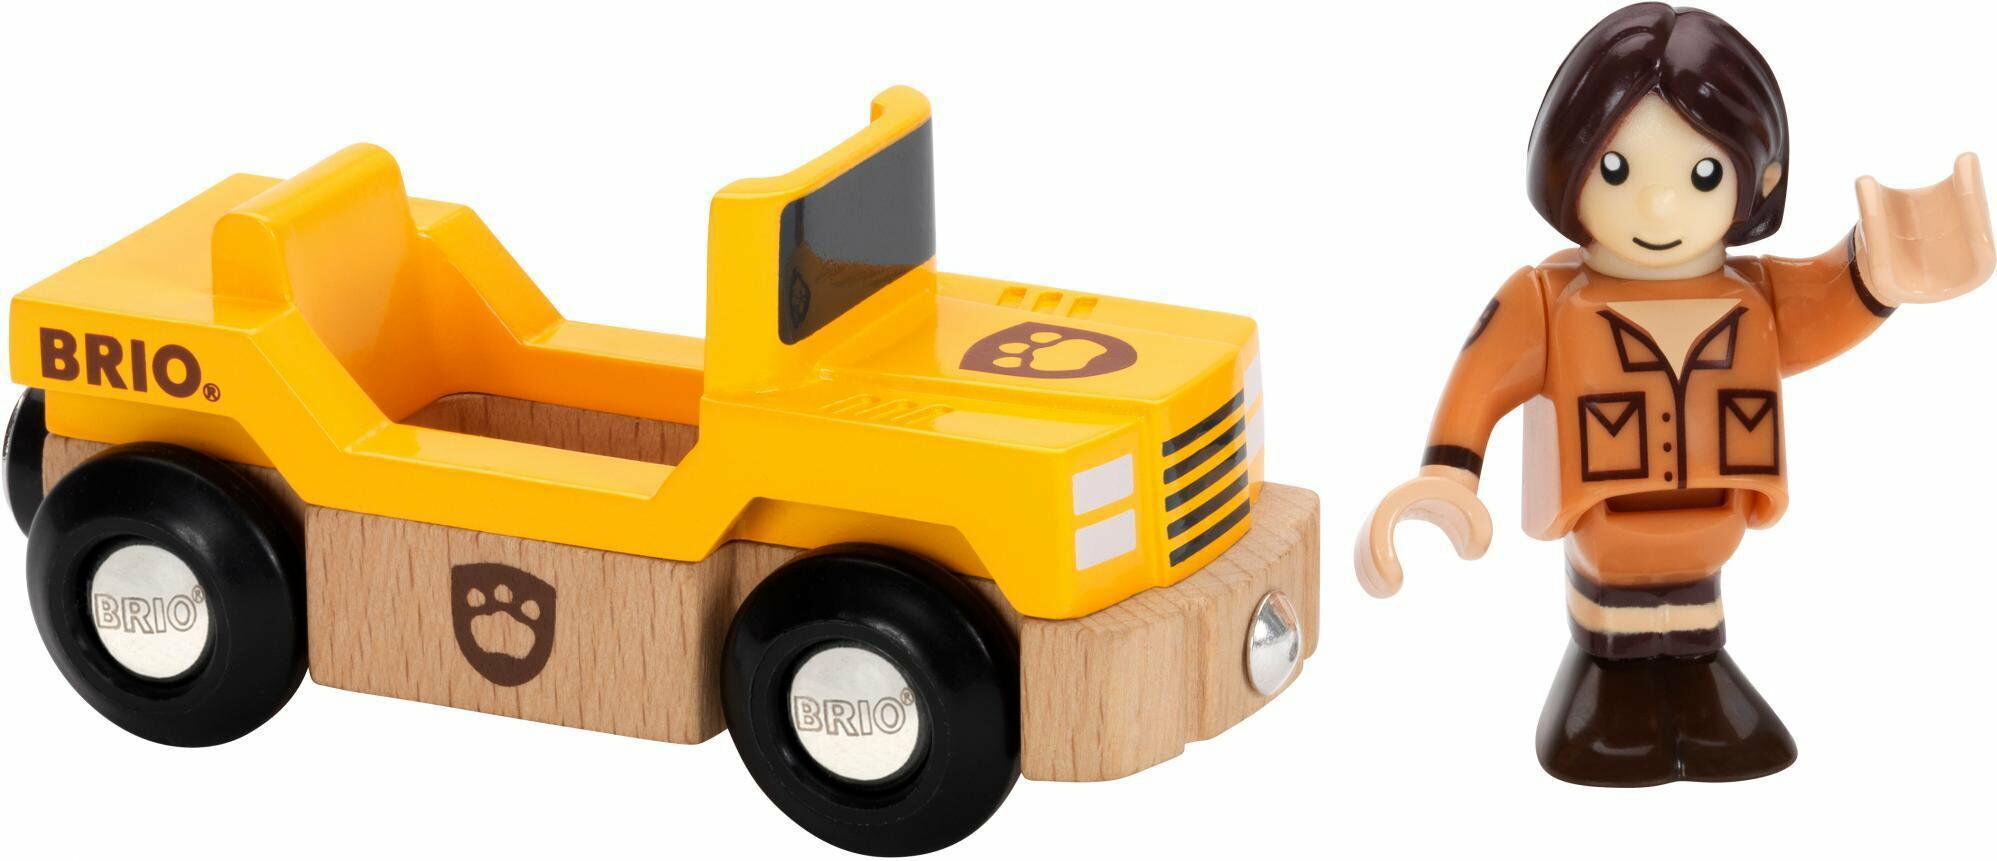 BRIO - Brio World Drewniany Pociąg Safari